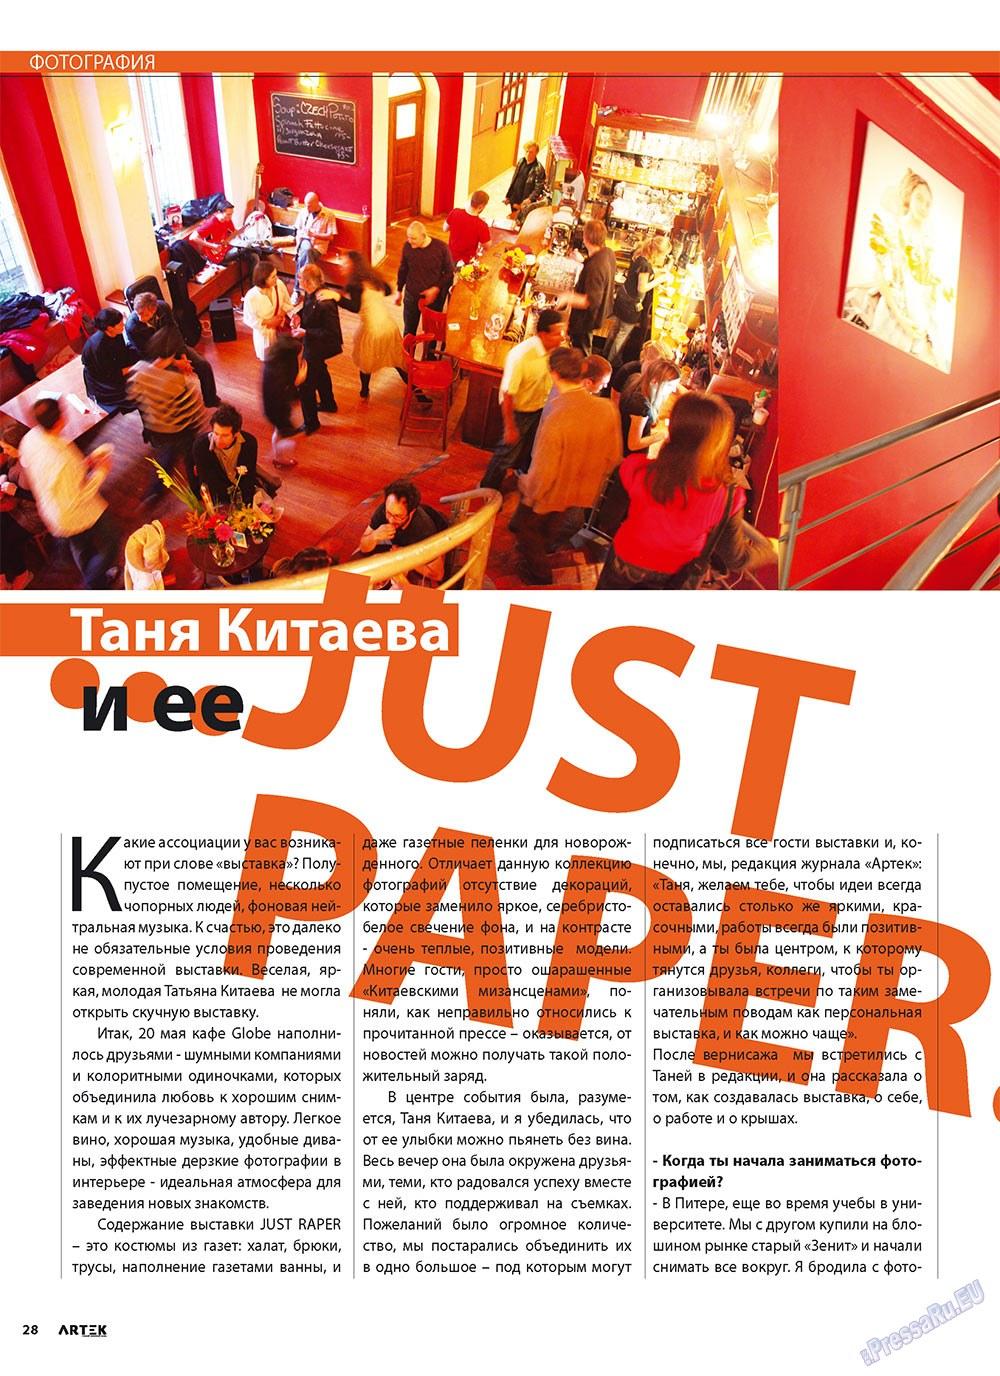 Артек (журнал). 2010 год, номер 3, стр. 30